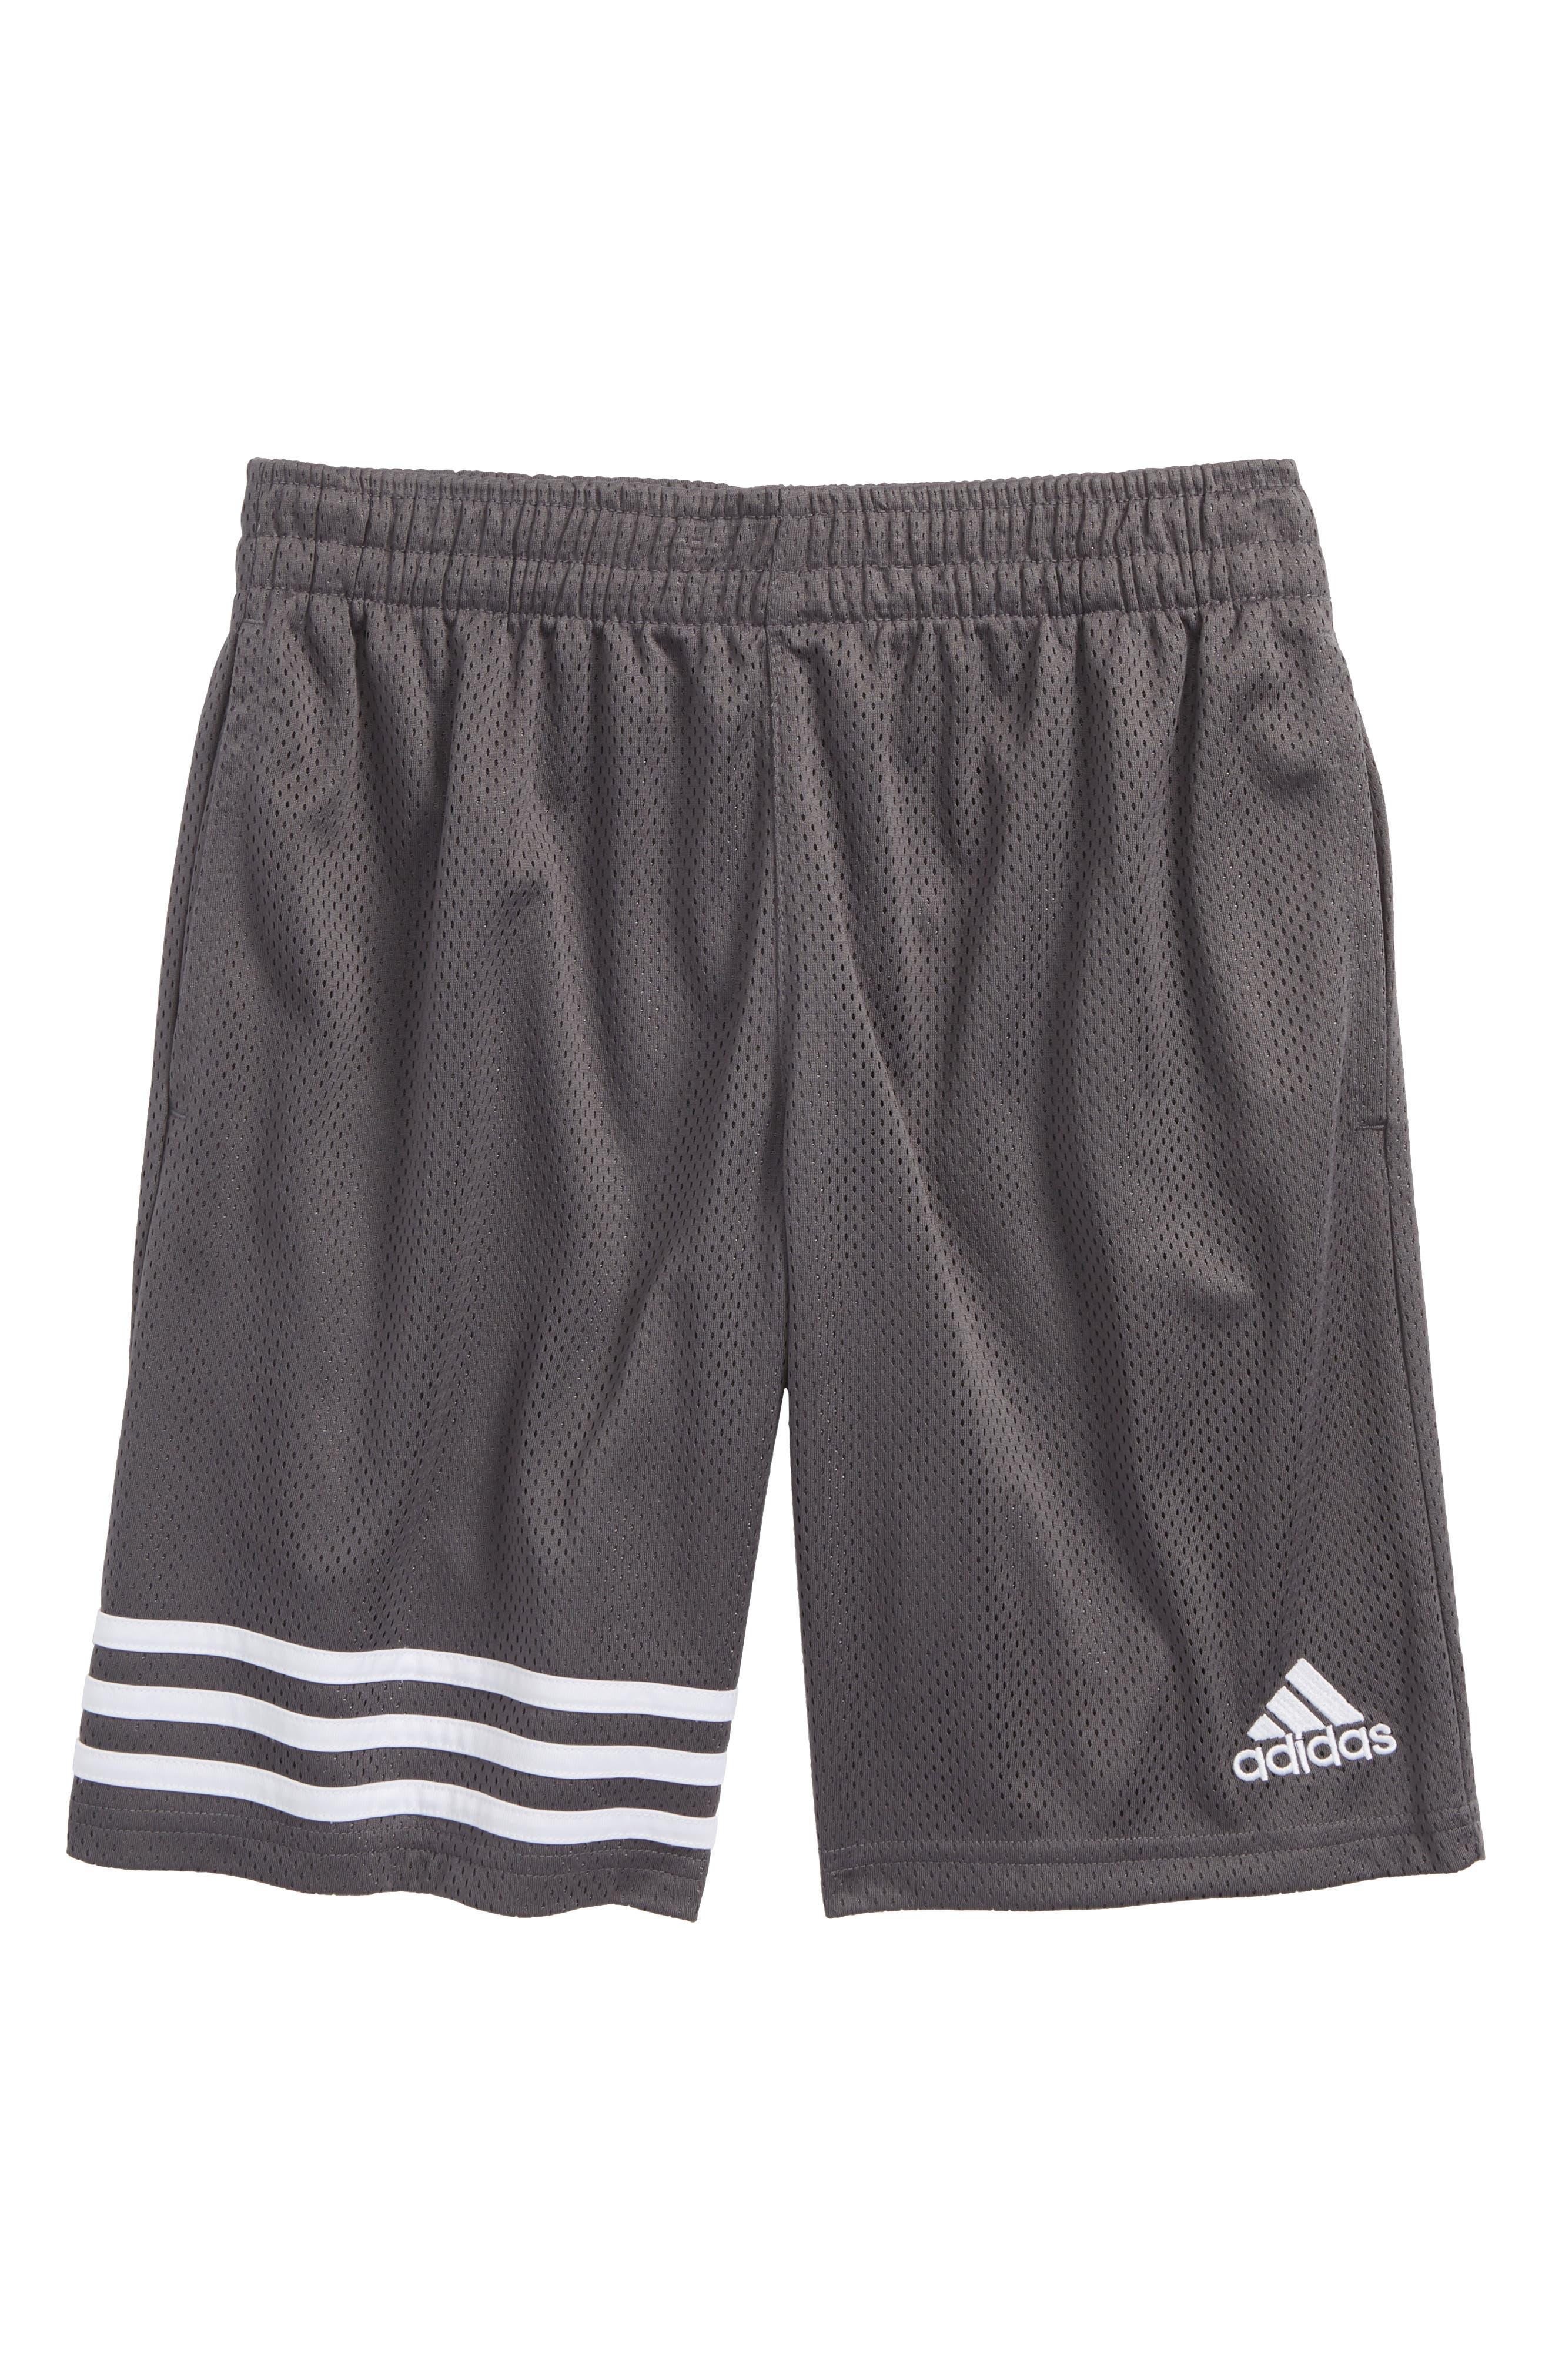 Replenishment Defender Shorts,                         Main,                         color, Dark Grey